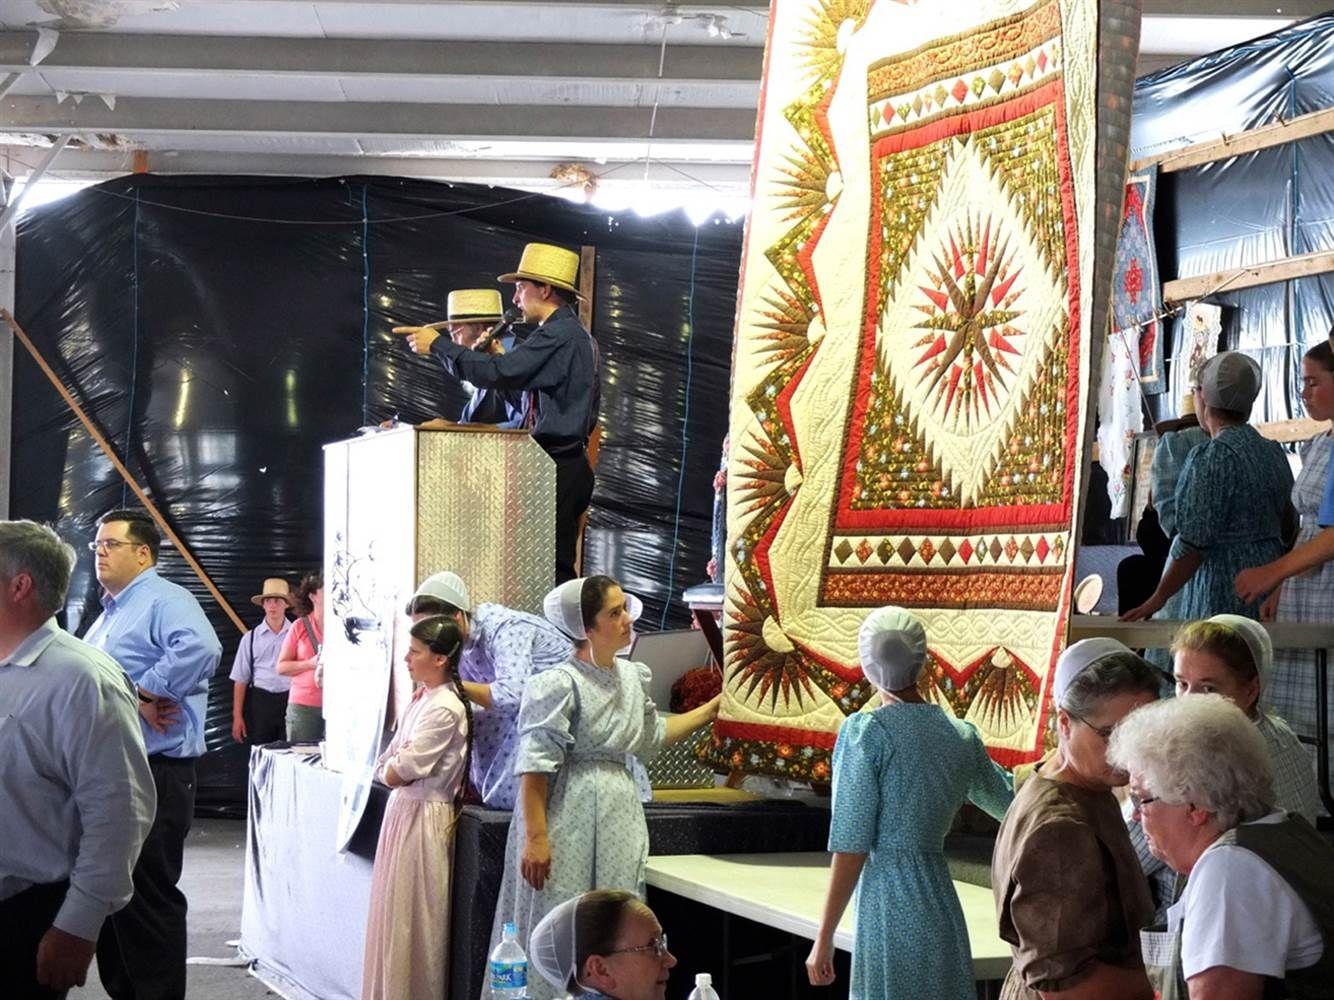 The Leola Benefit Auction, a live quilt auction, is held